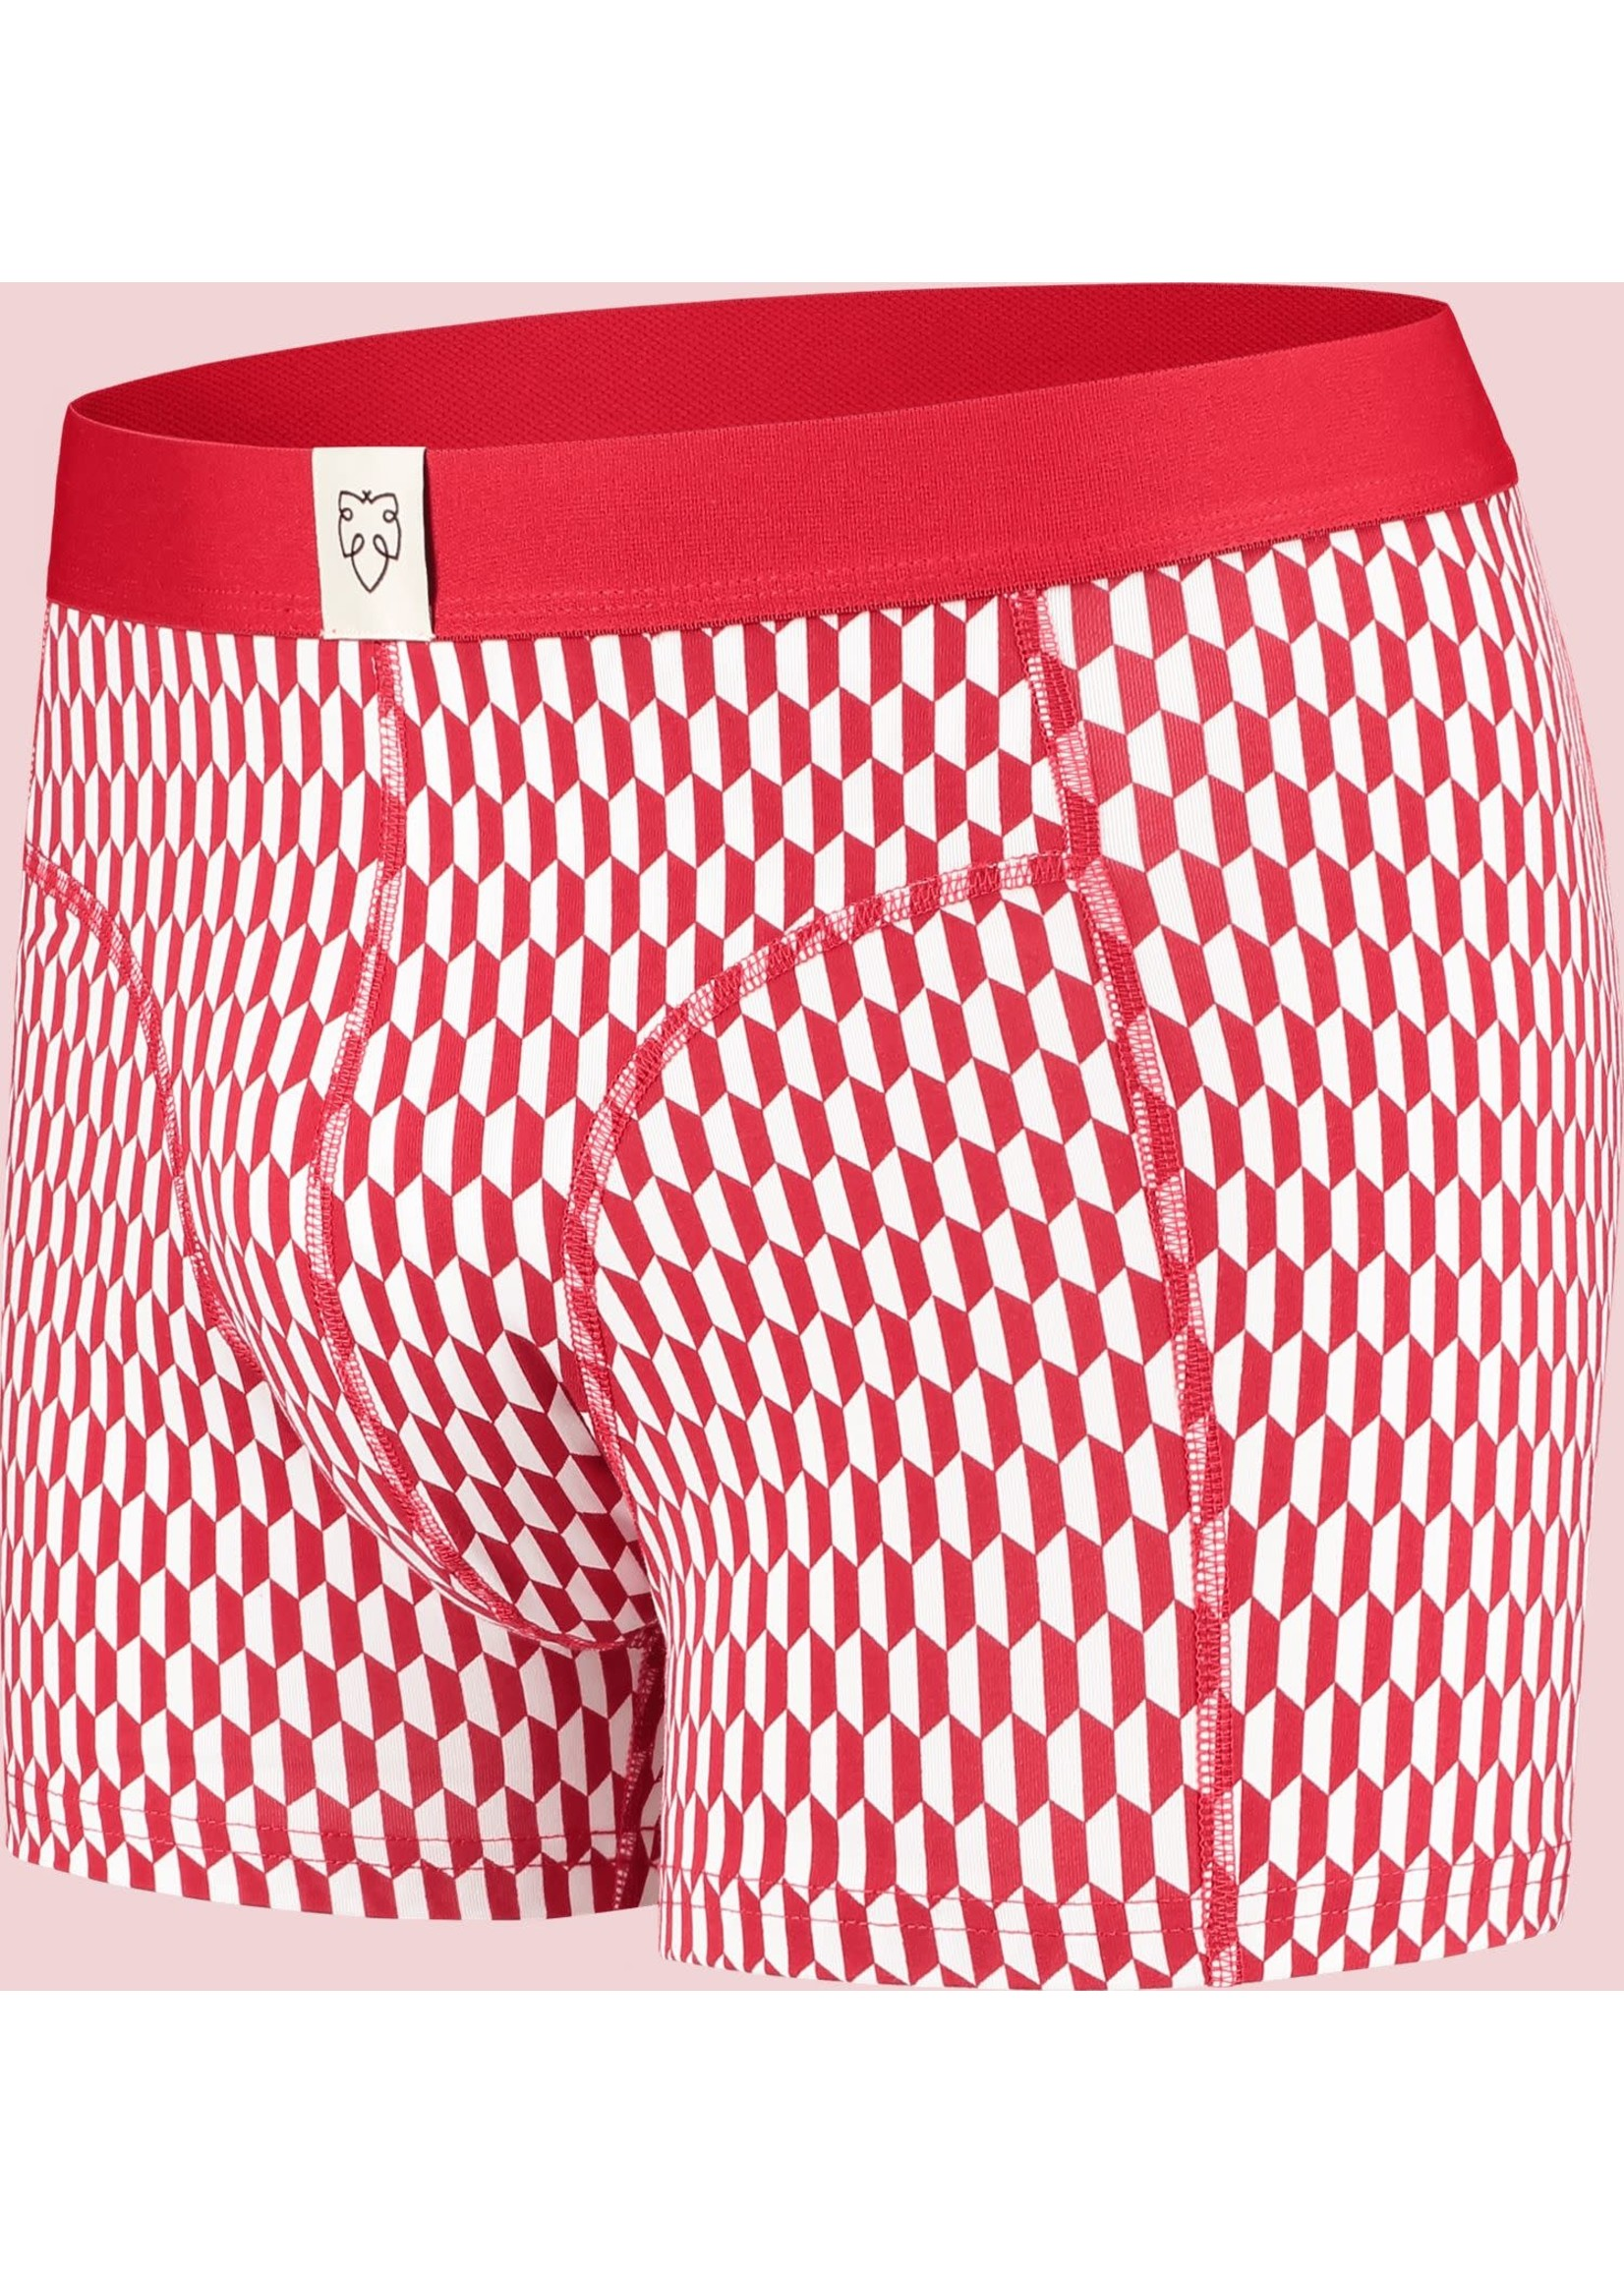 A-dam Underwear boxer Edwin